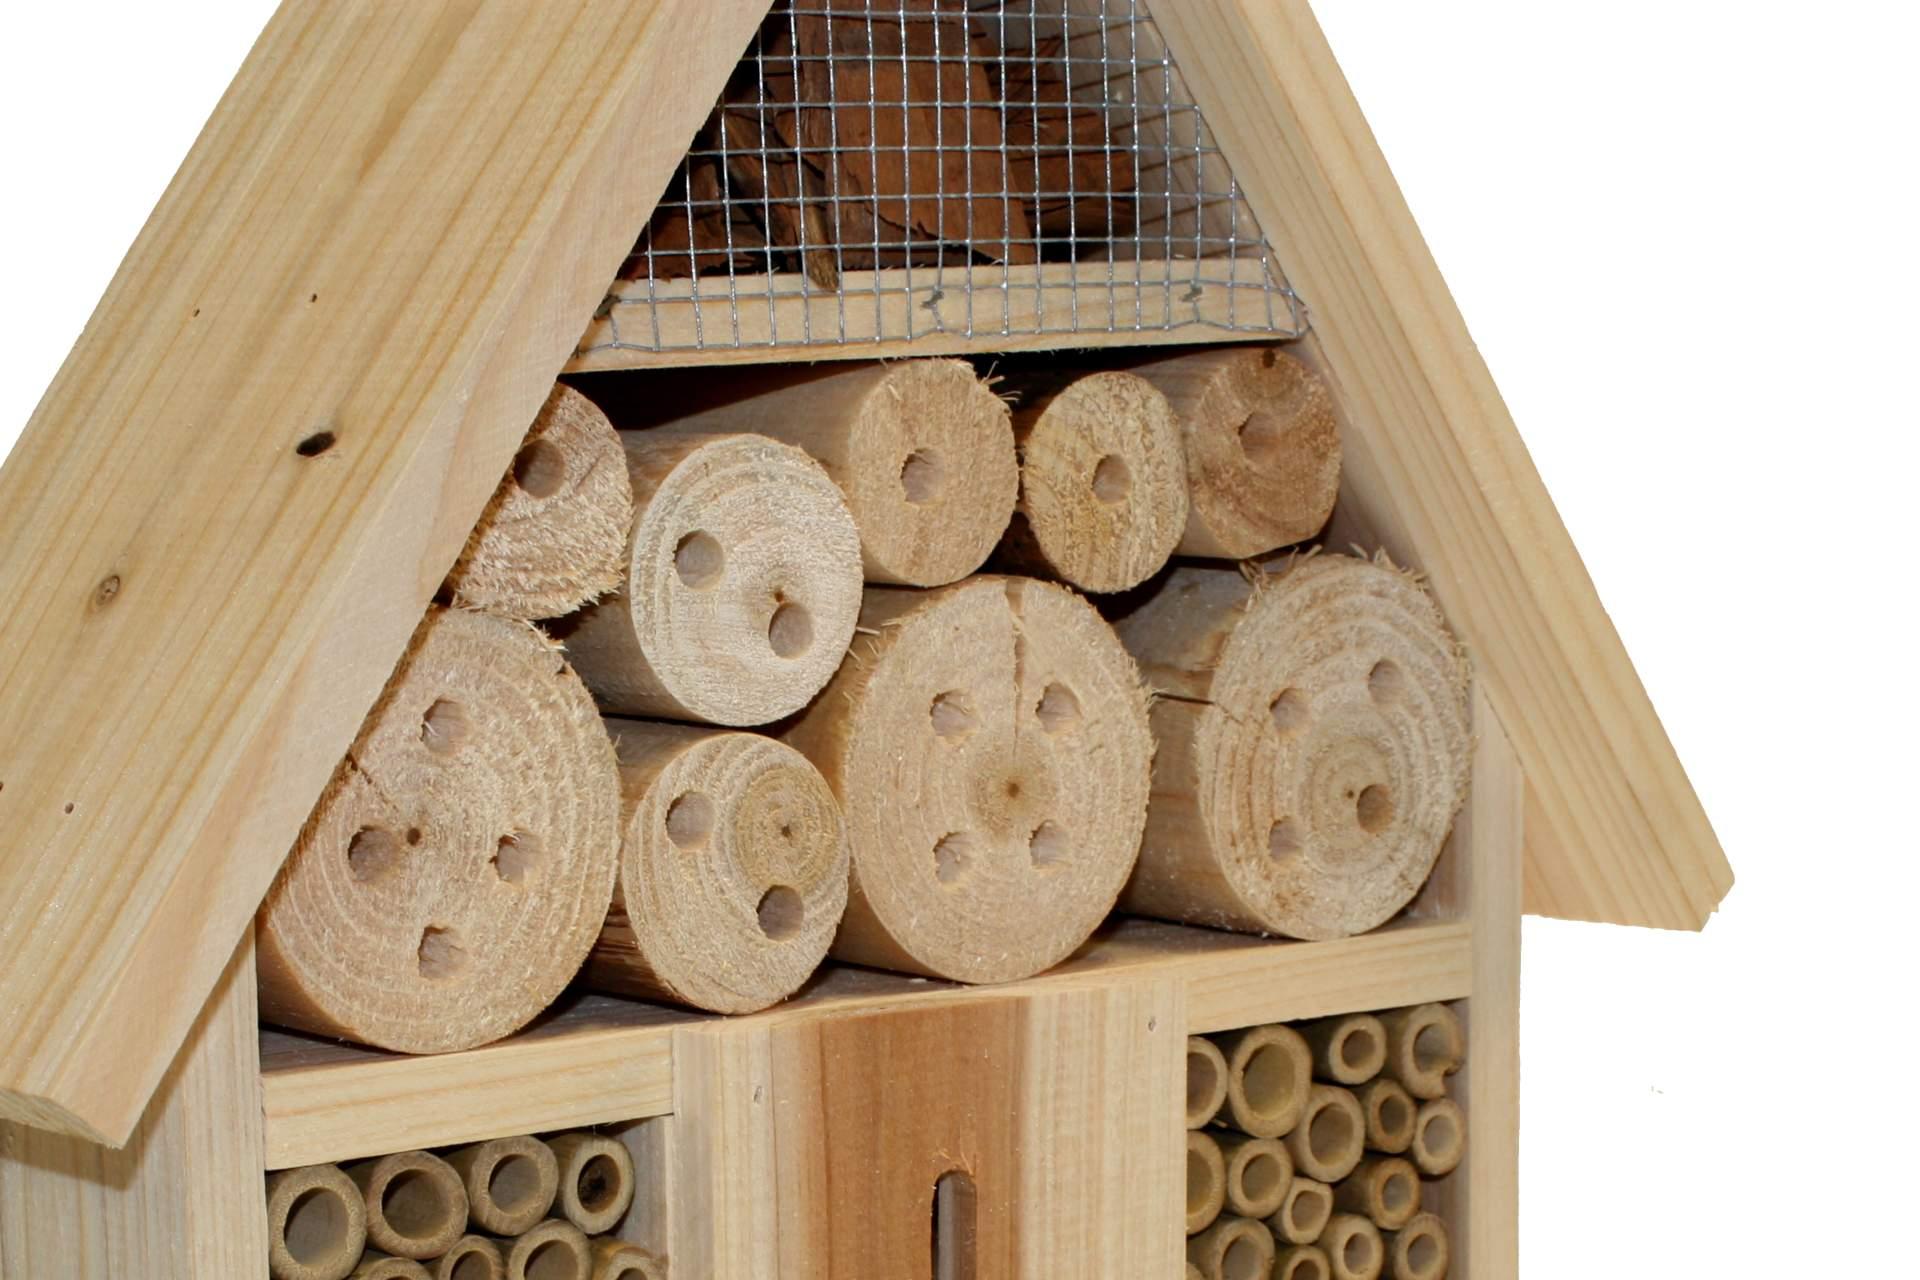 insektenhotel insektenhaus brutkasten nistkasten bienen. Black Bedroom Furniture Sets. Home Design Ideas